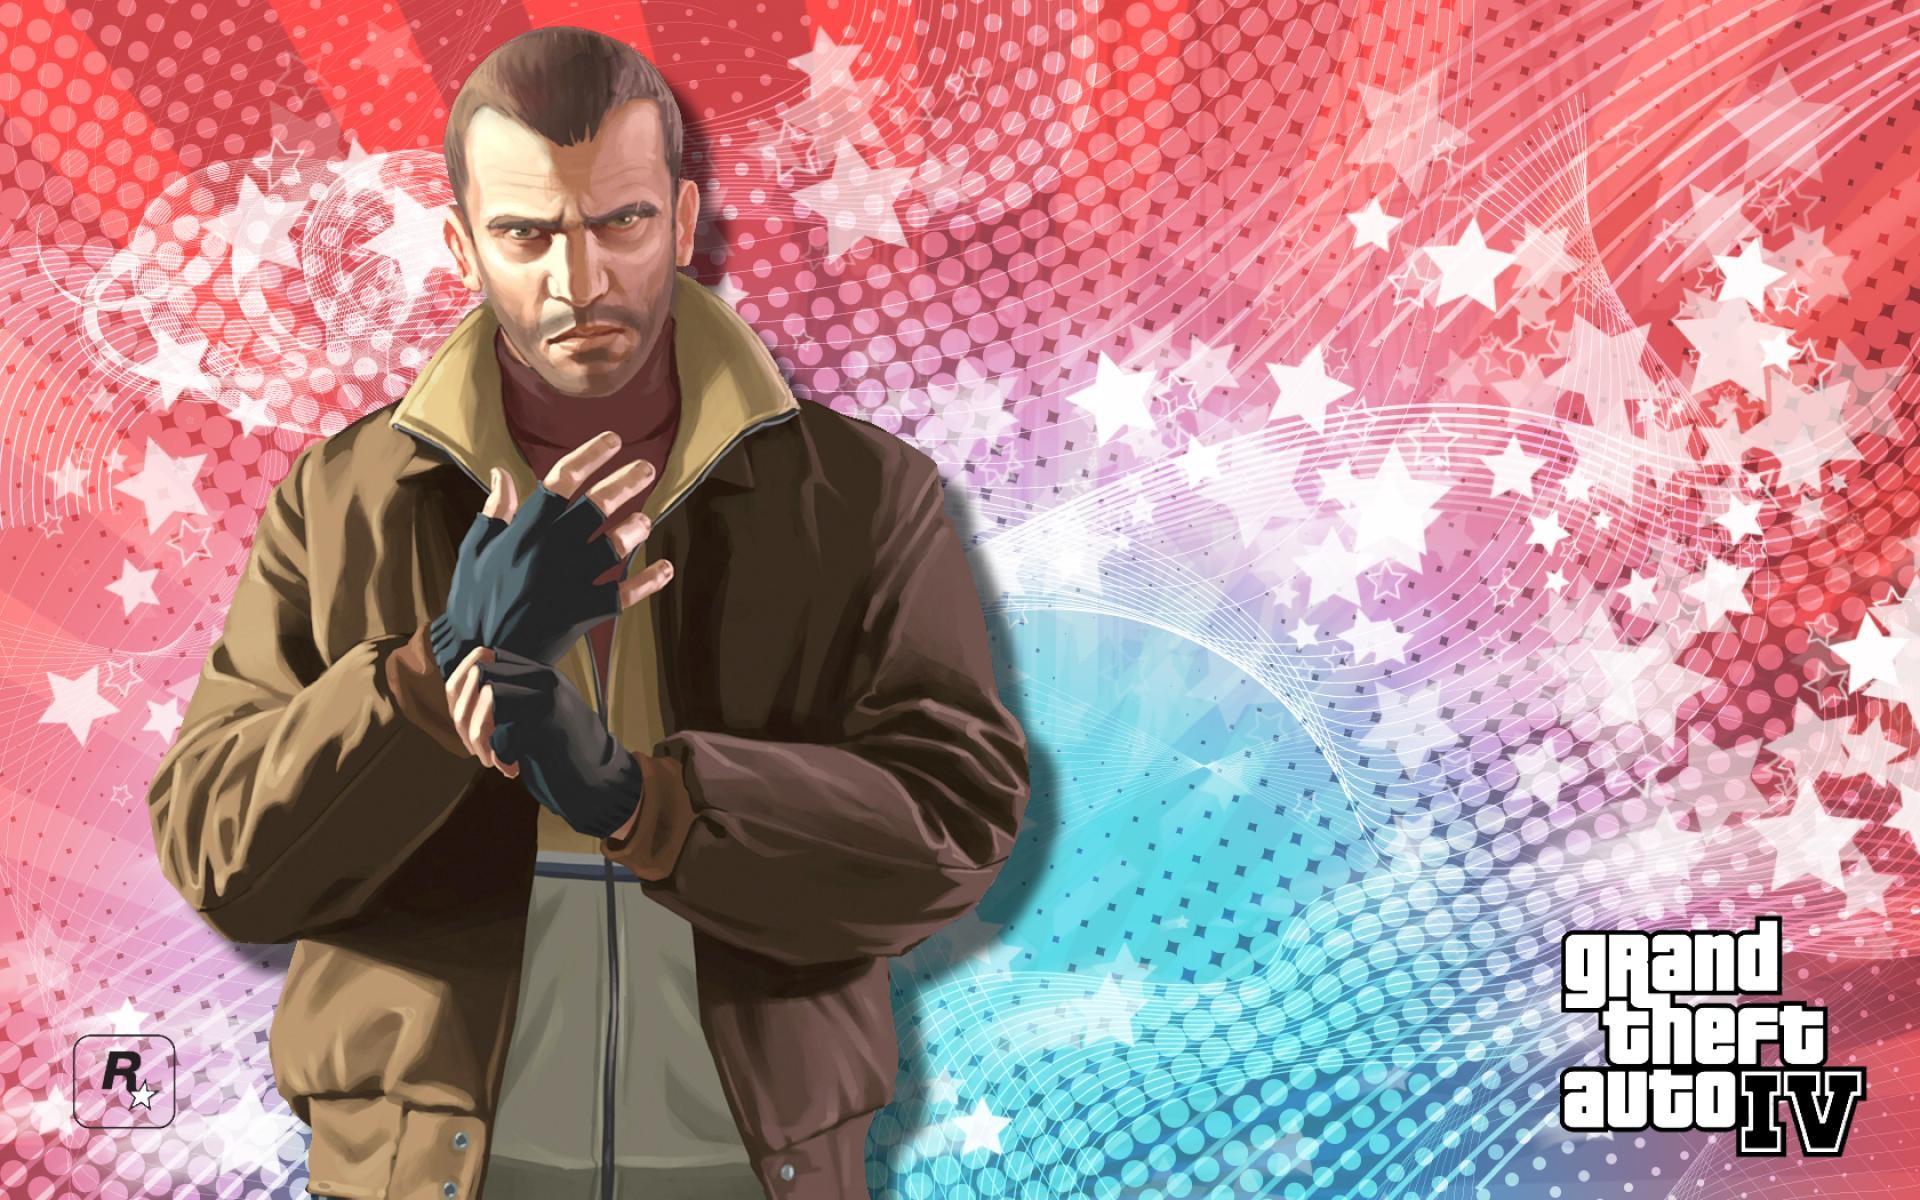 Grand Theft Auto V, Niko Bellic, Fictional Character, - Gta 4 Loading Scenes , HD Wallpaper & Backgrounds